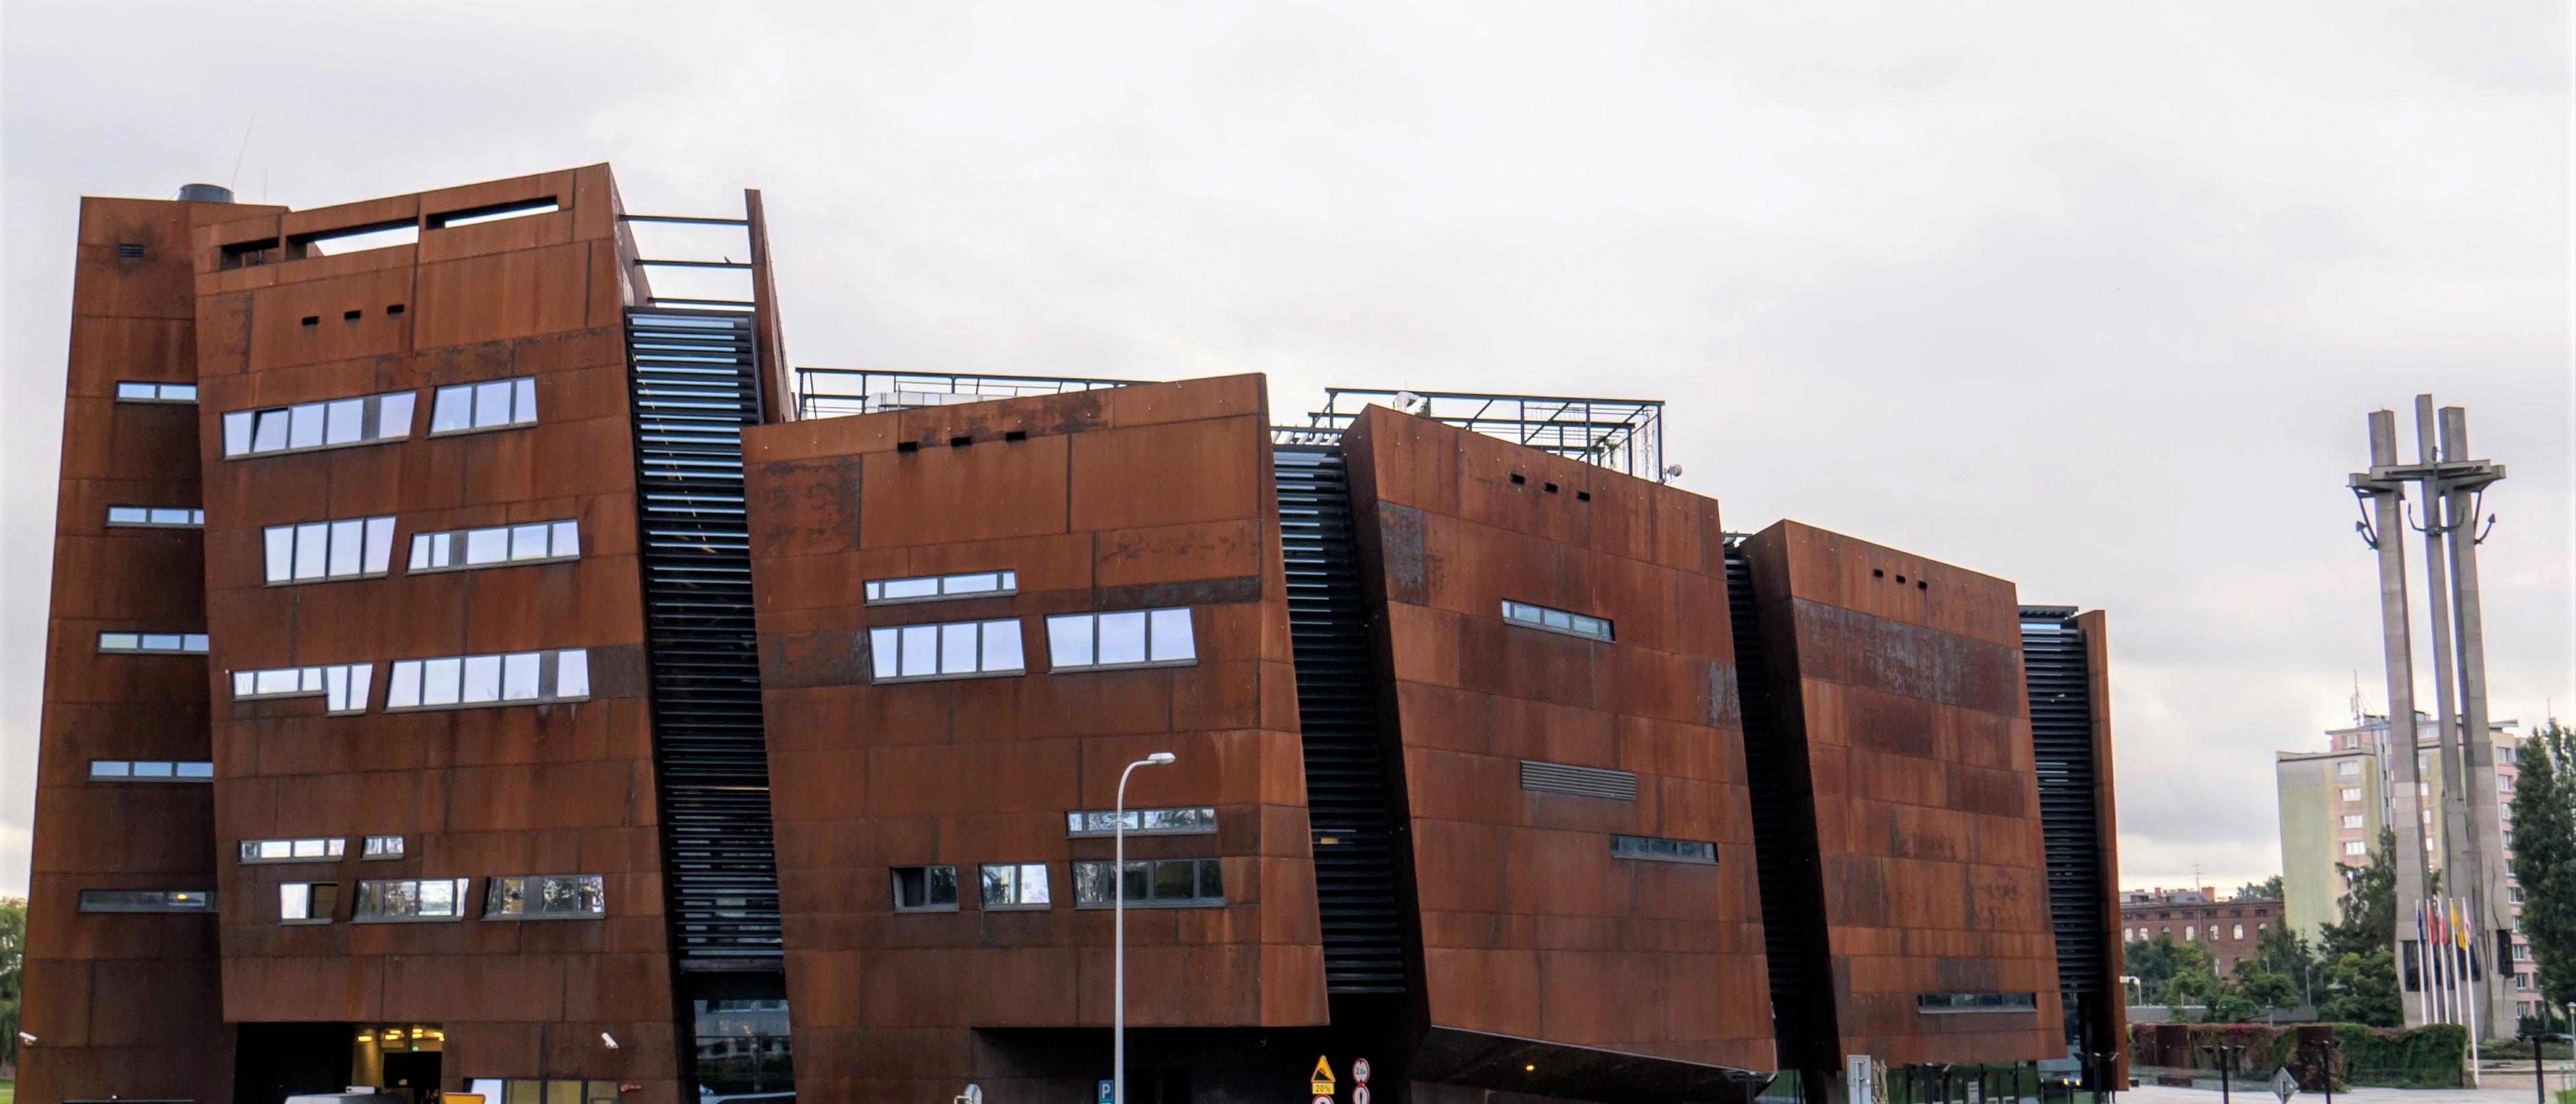 jak-bylo-na-blog-forum-gdansk-o-przekraczaniu-granic